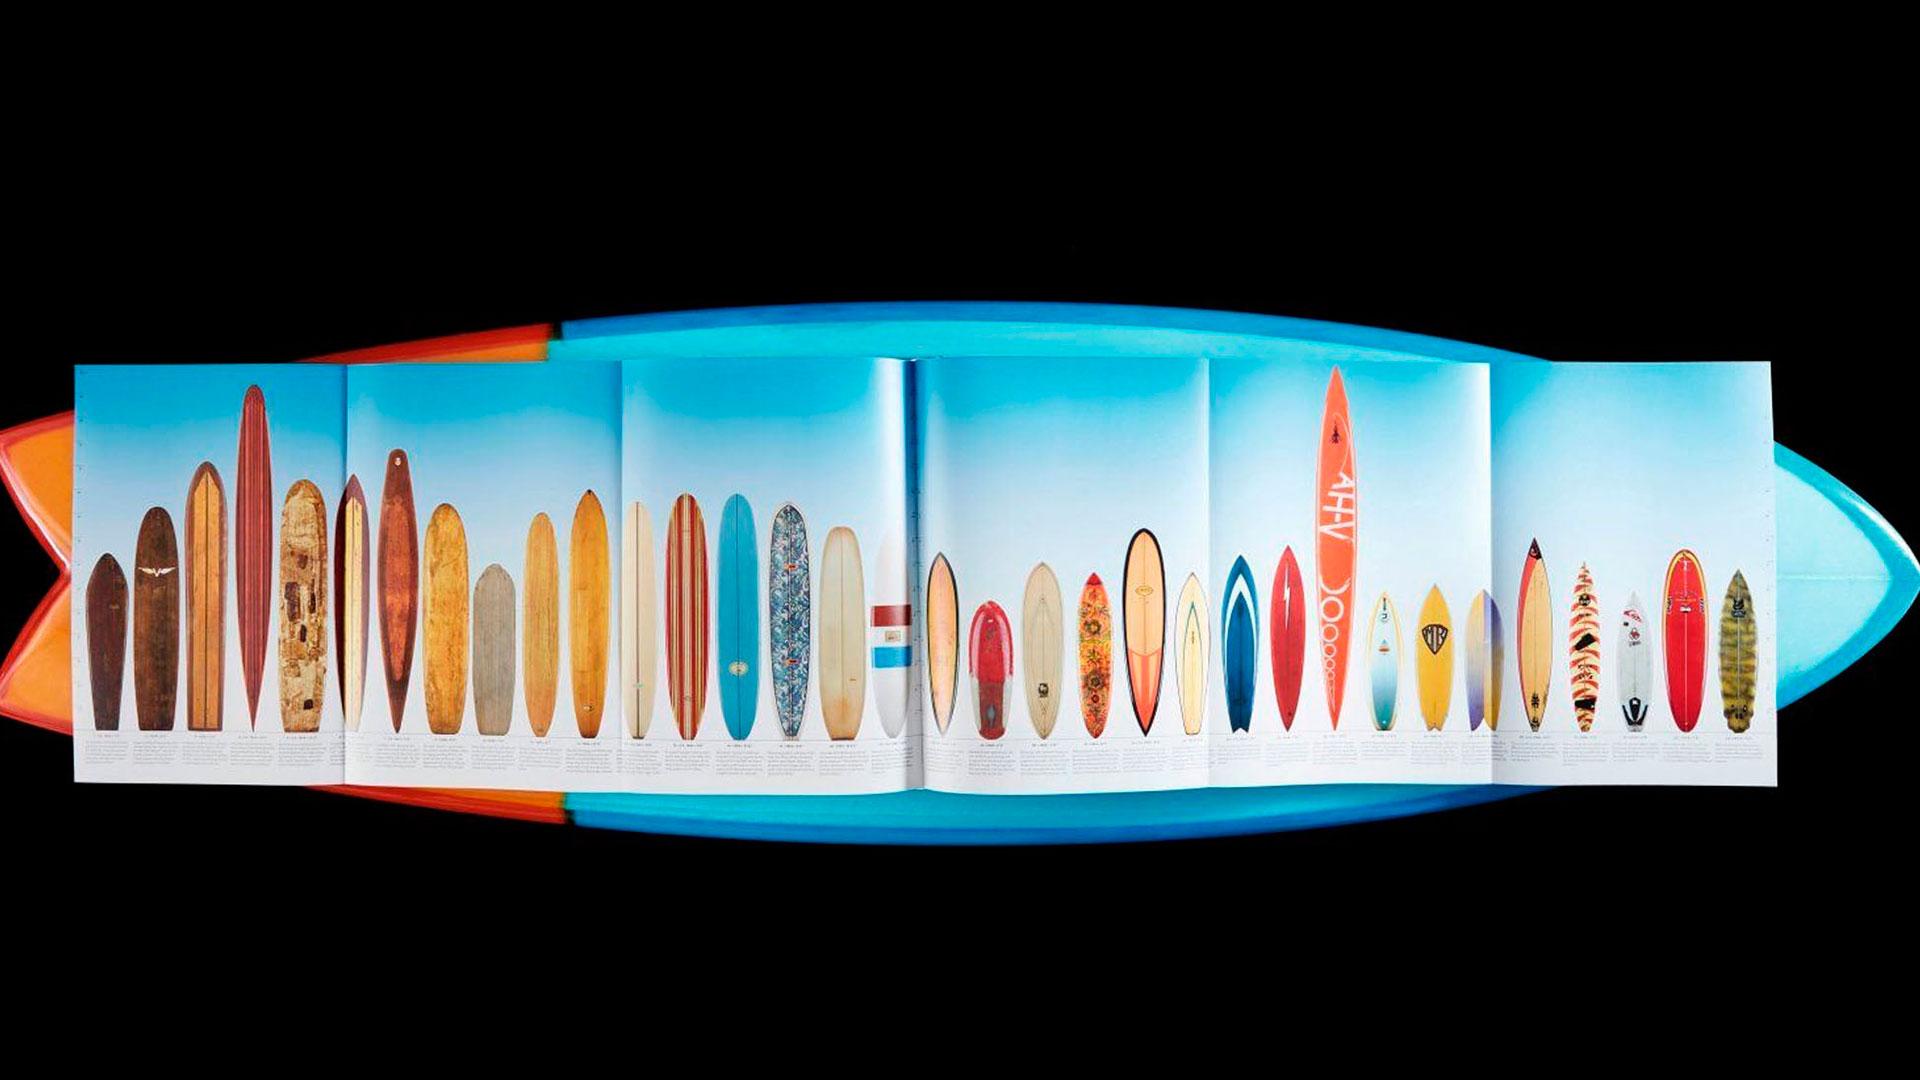 El homenaje al Surf hero asset